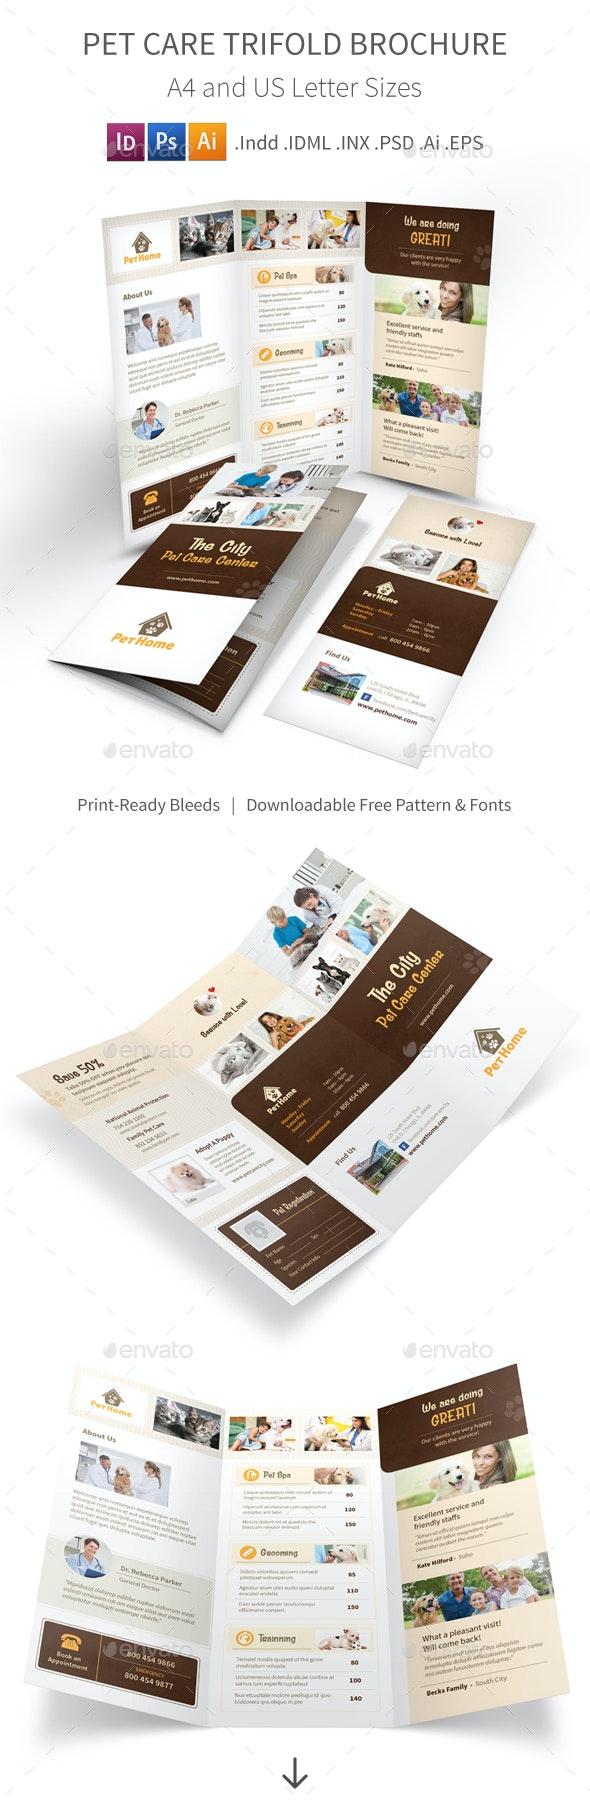 Pet Care Trifold Brochure 3 - Informational Brochures